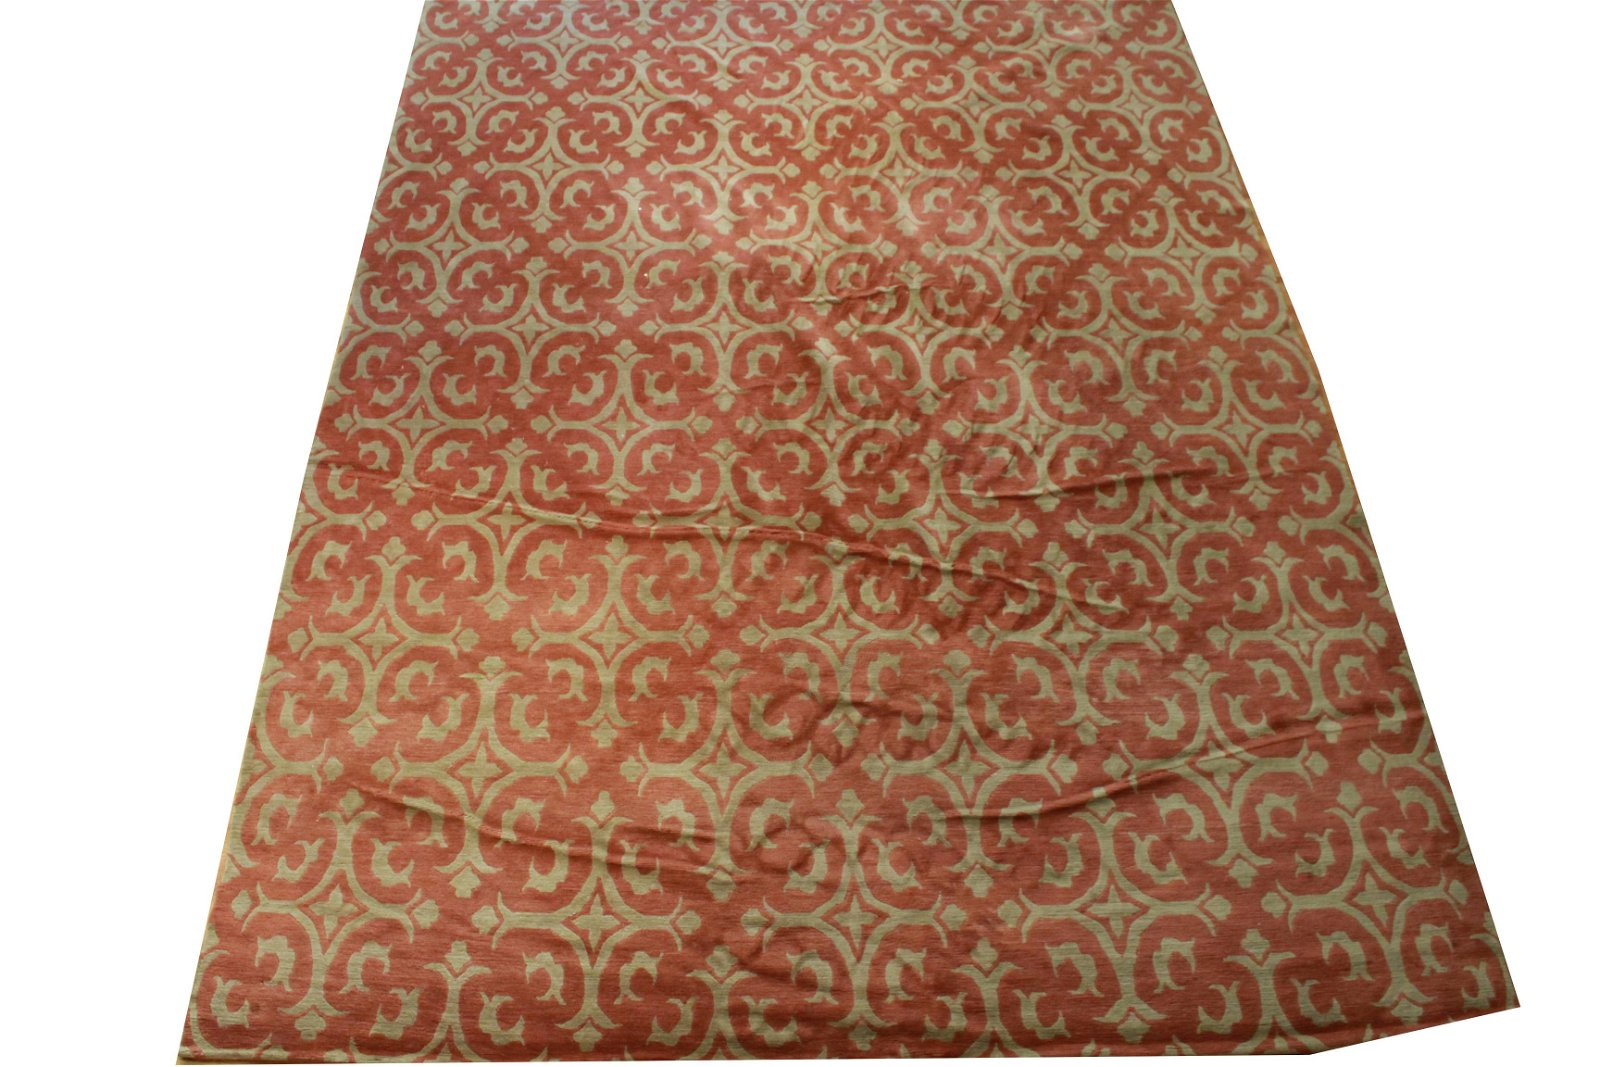 Odegard Modern Carpet 11.5' x 8.5'